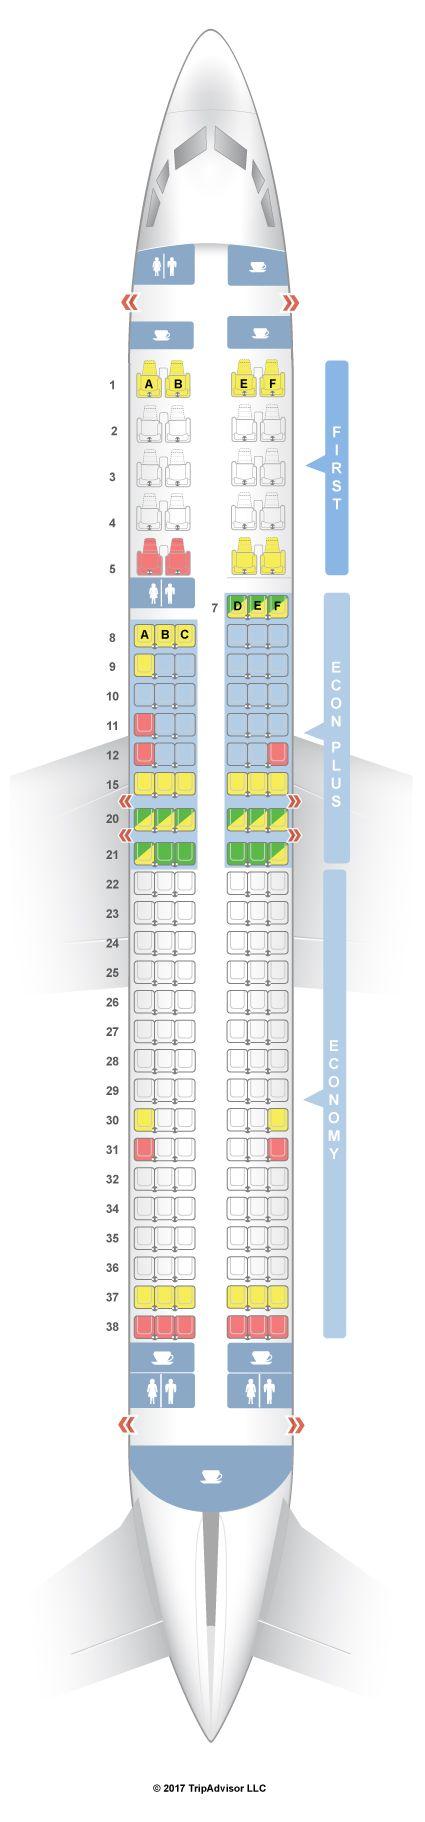 Seatguru Seat Map United Boeing 737 900 739 V1 V2 Seatguru Boeing Packing Tips For Travel